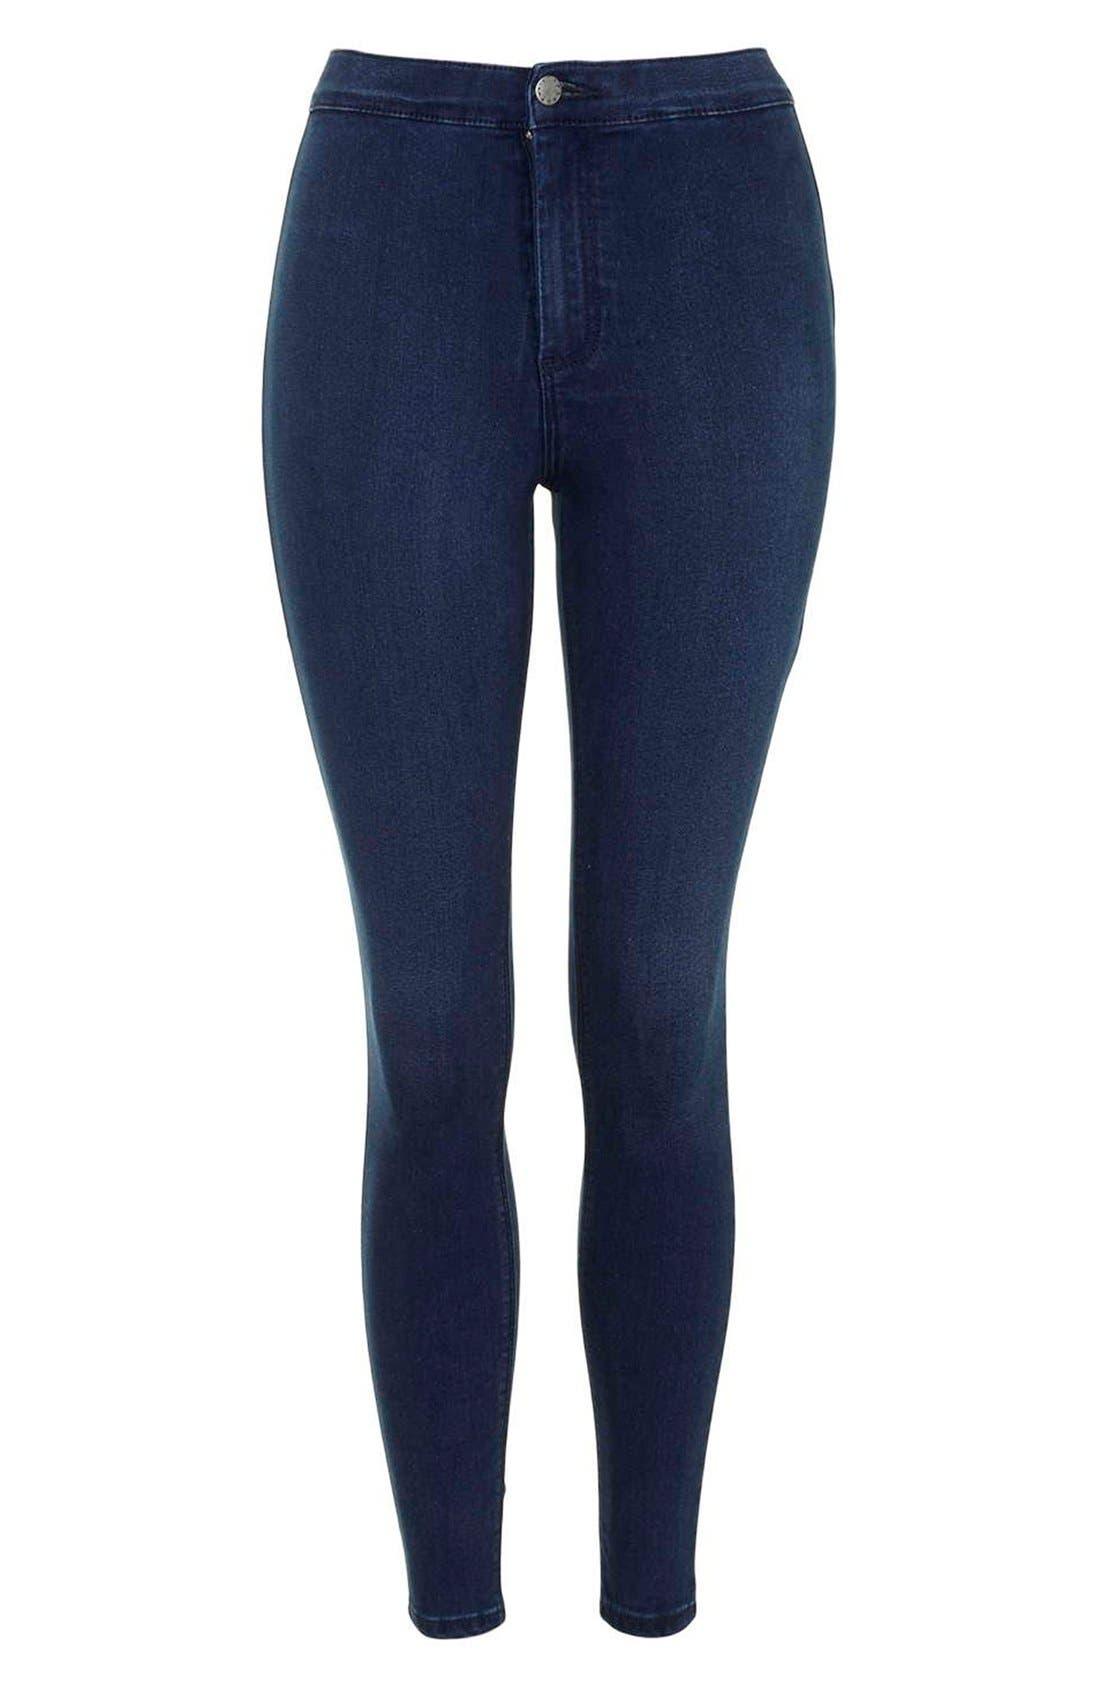 Alternate Image 4  - Topshop 'Joni' Crop Super Skinny Jeans (Petite)